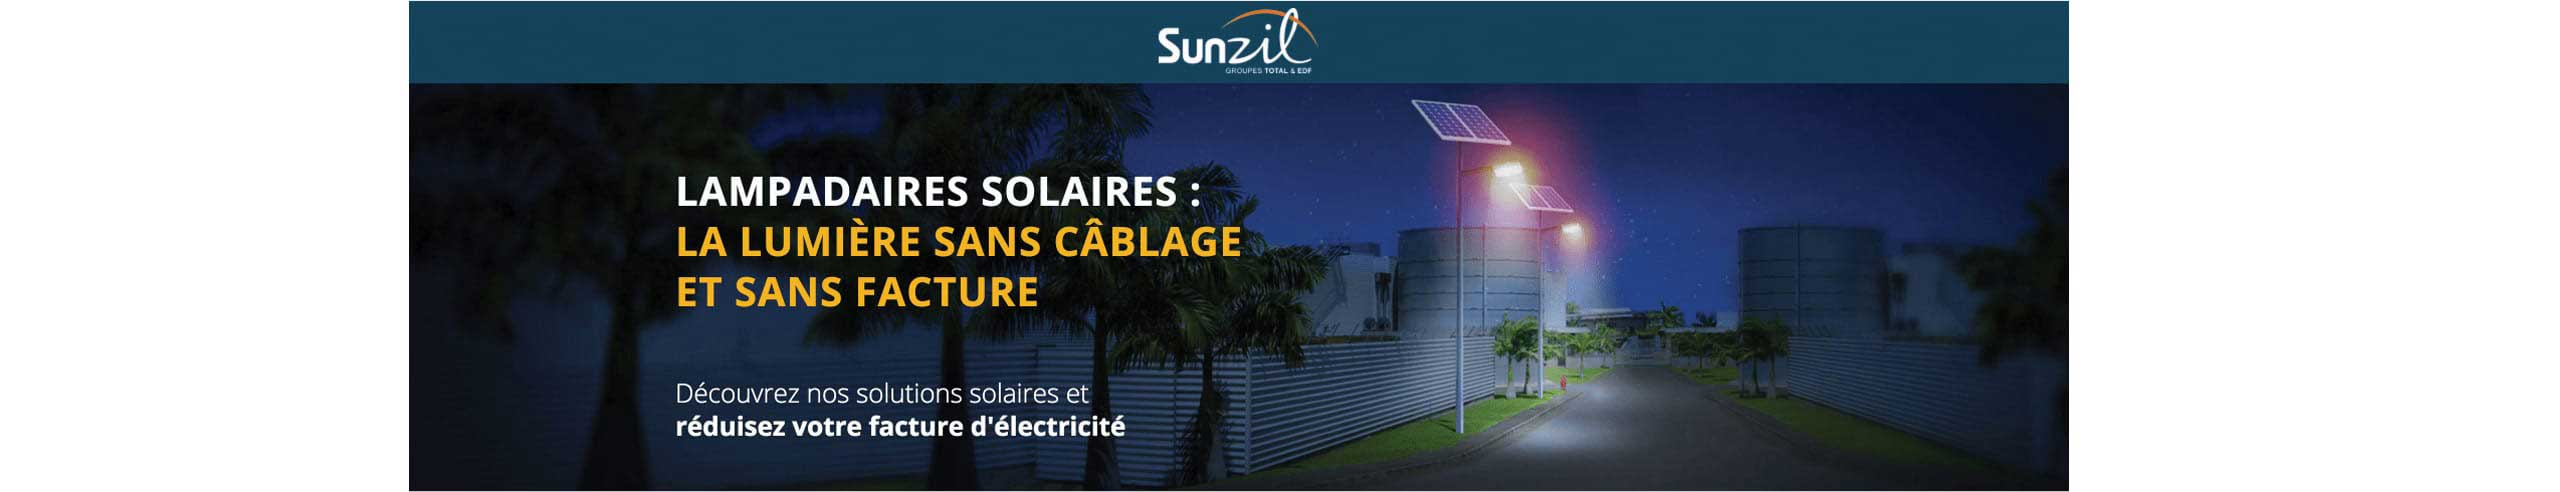 sunzil-banniere-2